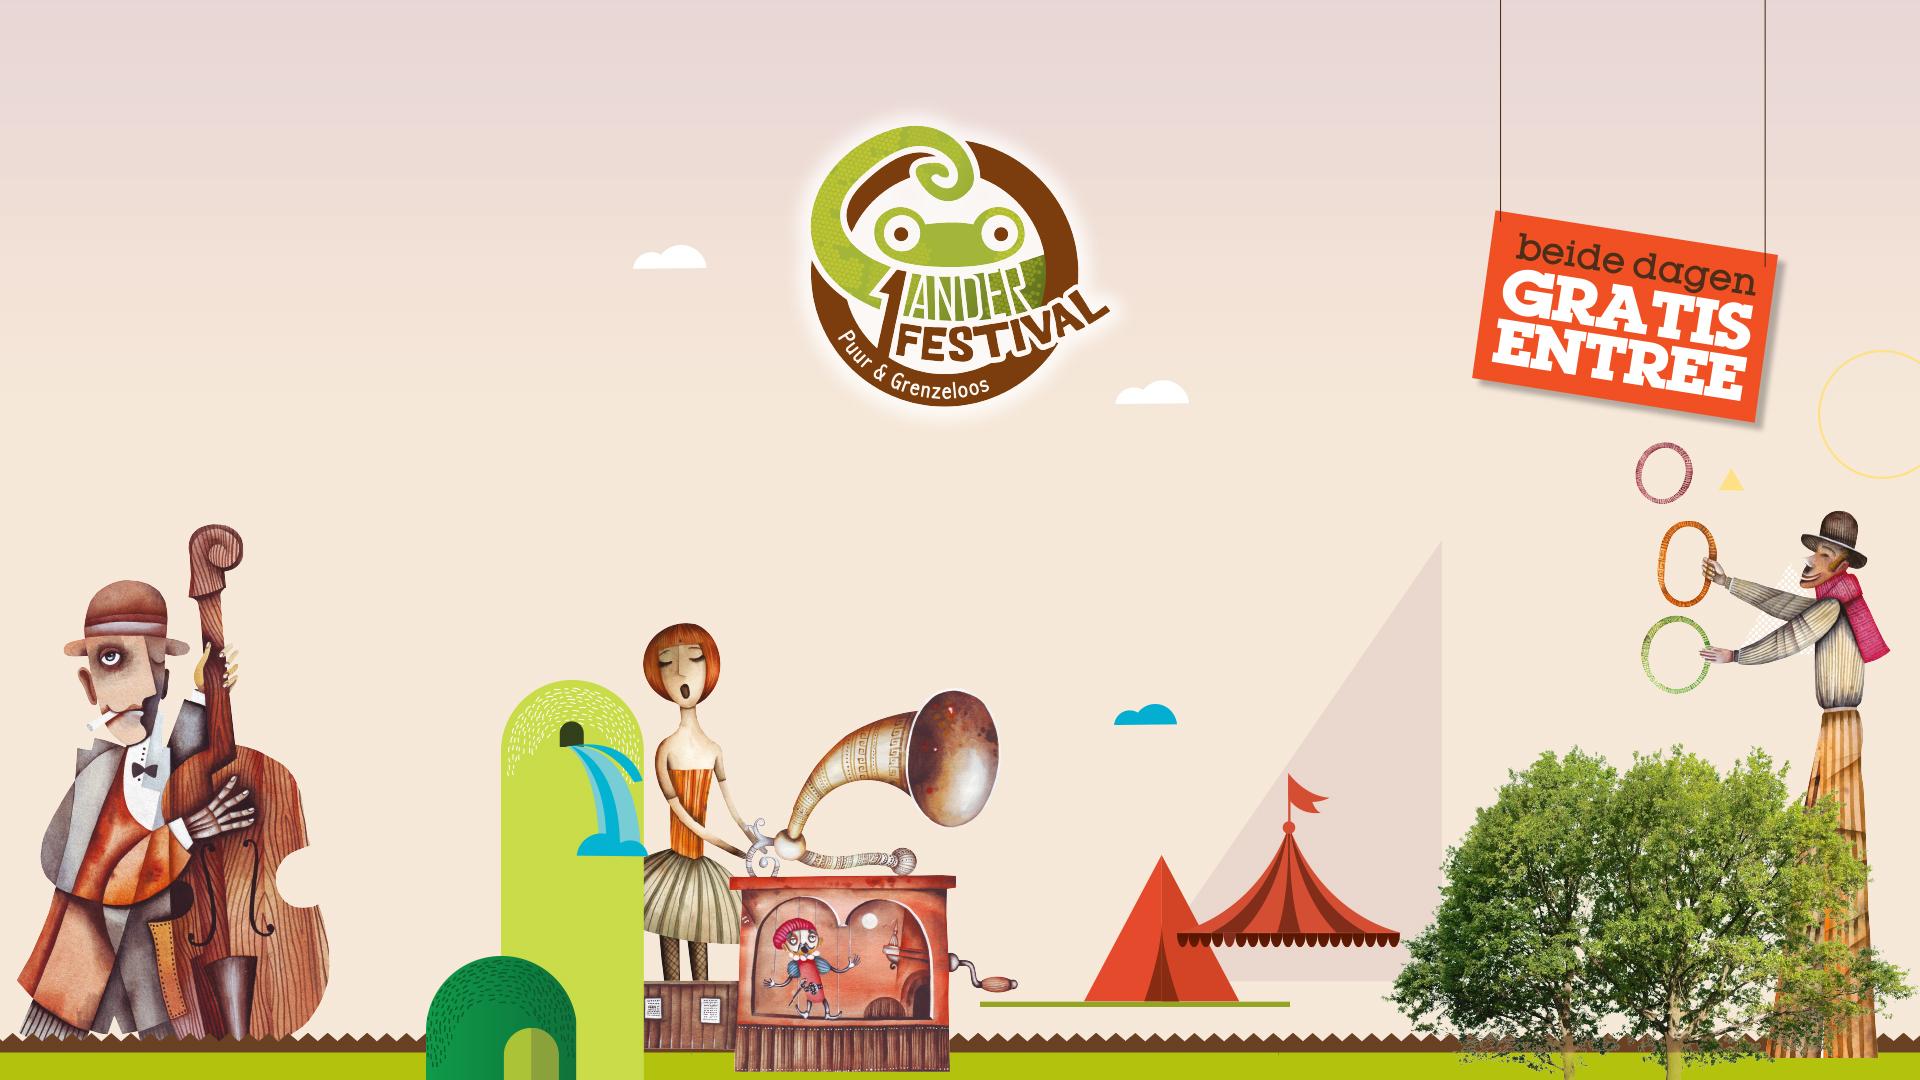 1anderfestival